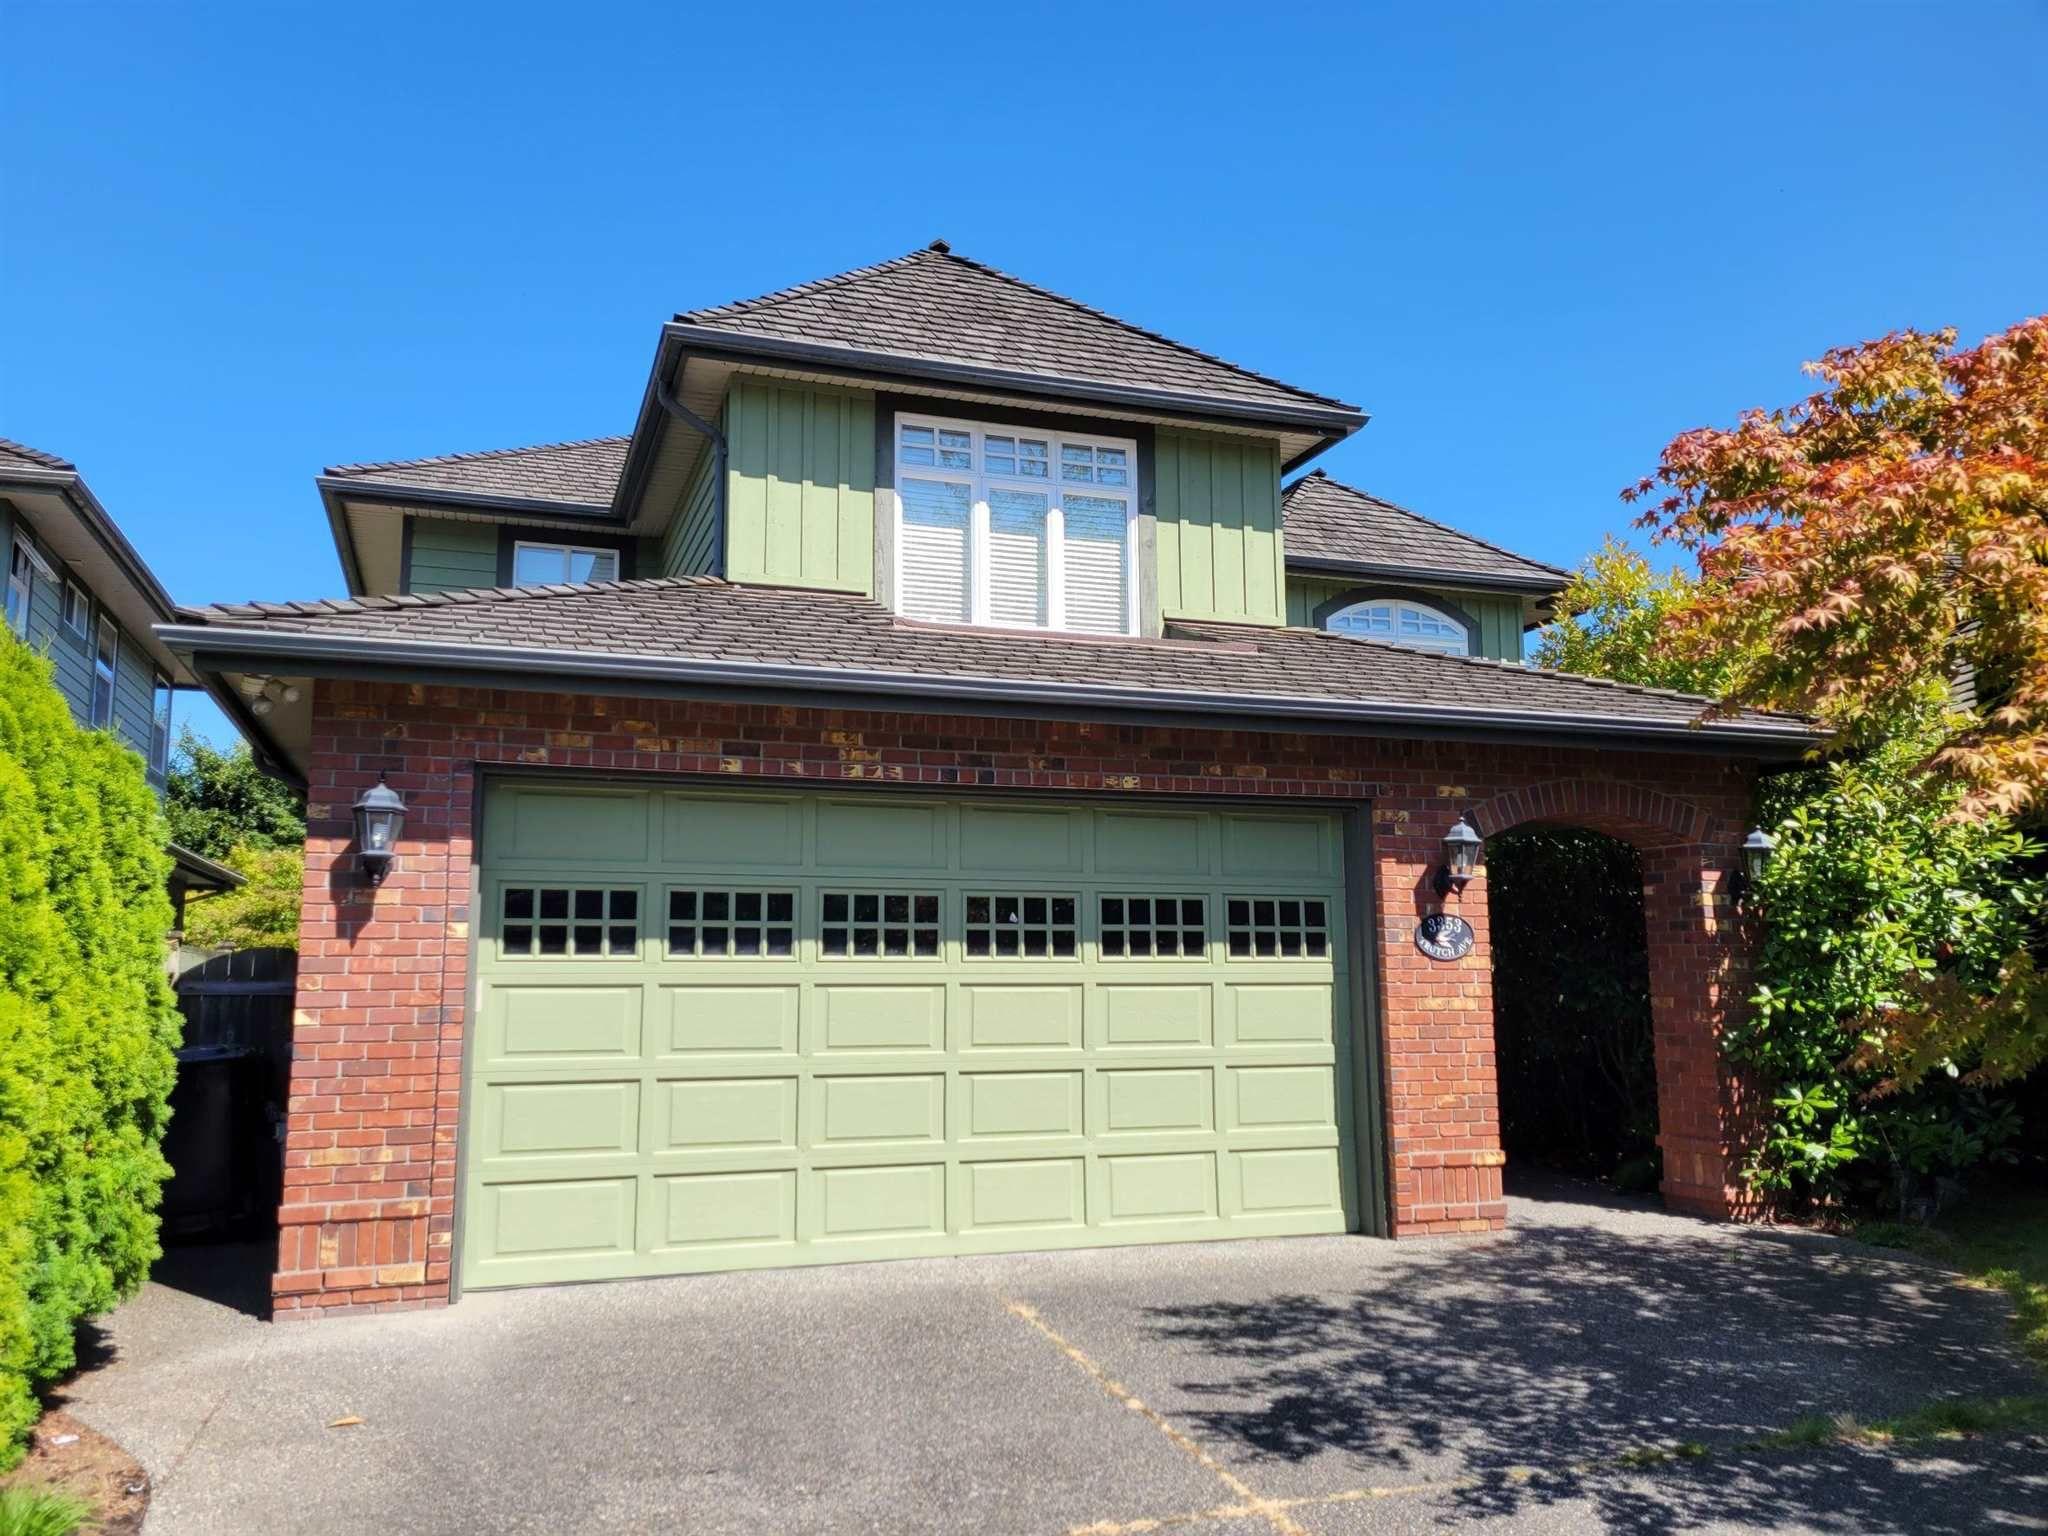 Main Photo: 3353 TRUTCH Avenue in Richmond: Terra Nova House for sale : MLS®# R2604861